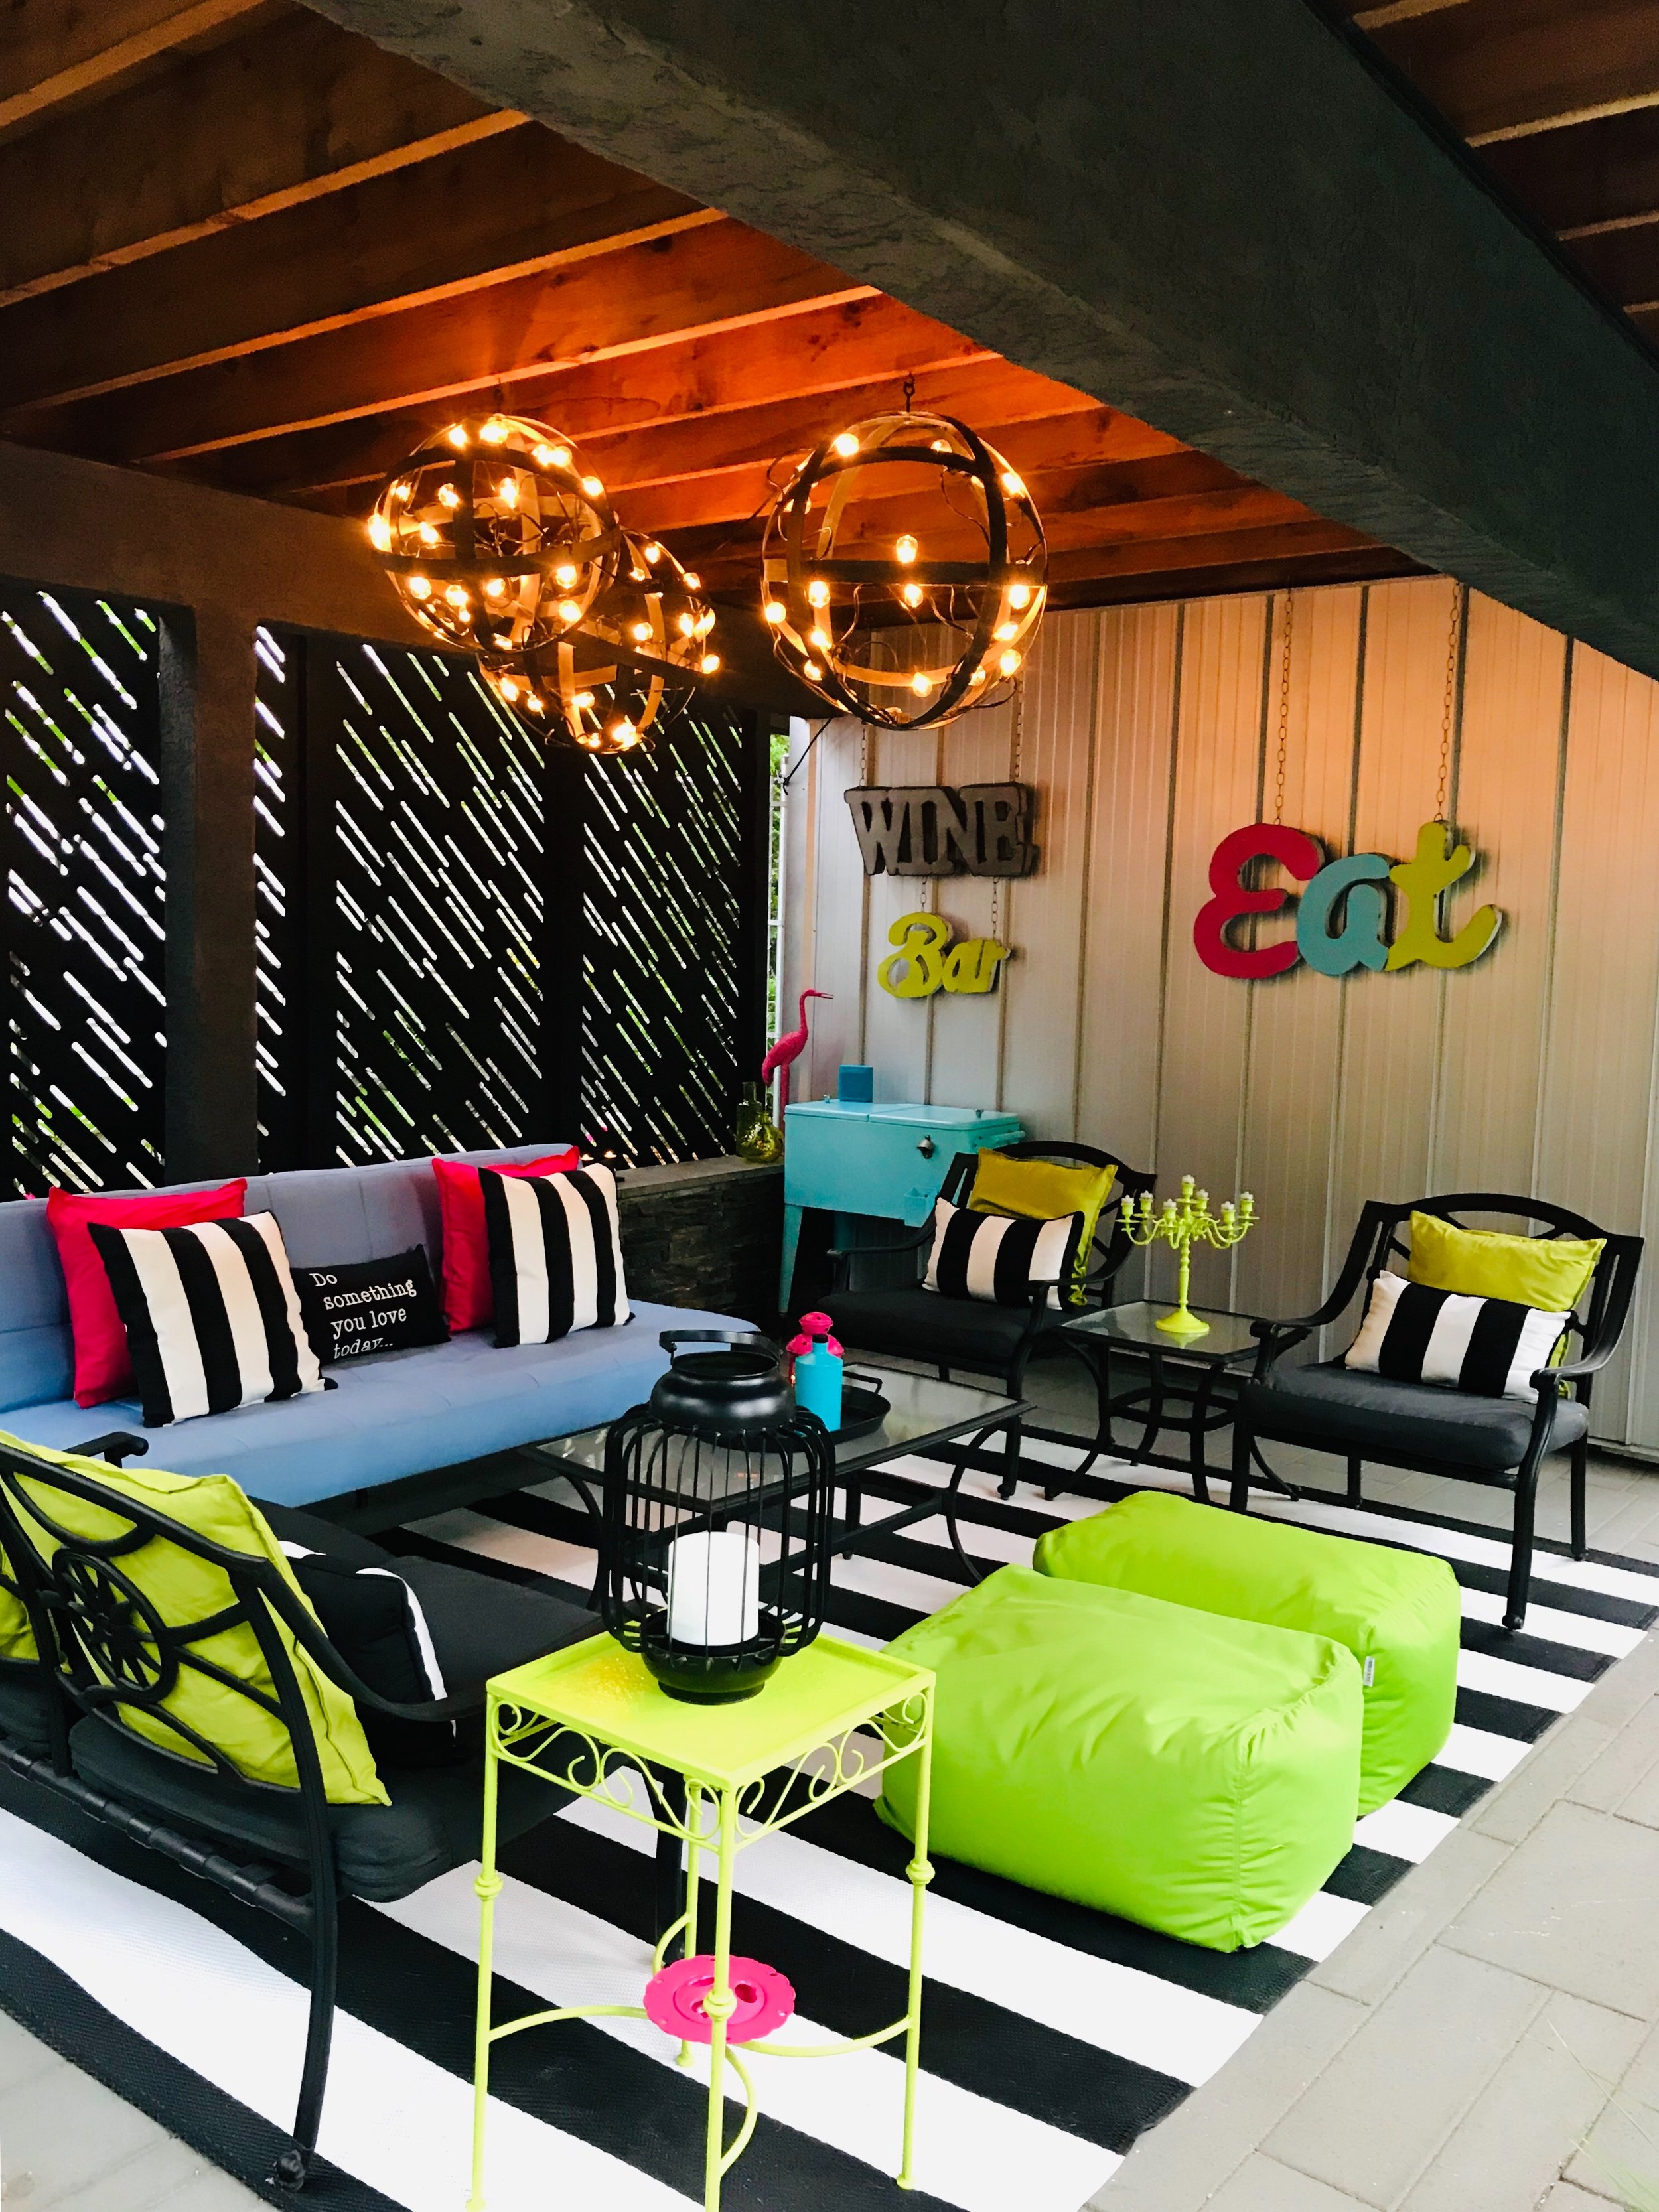 Underground Chill Lounge-Wine Bar-Patio Furniture-Style Maven Decor Interior Design-Edmonton Canada